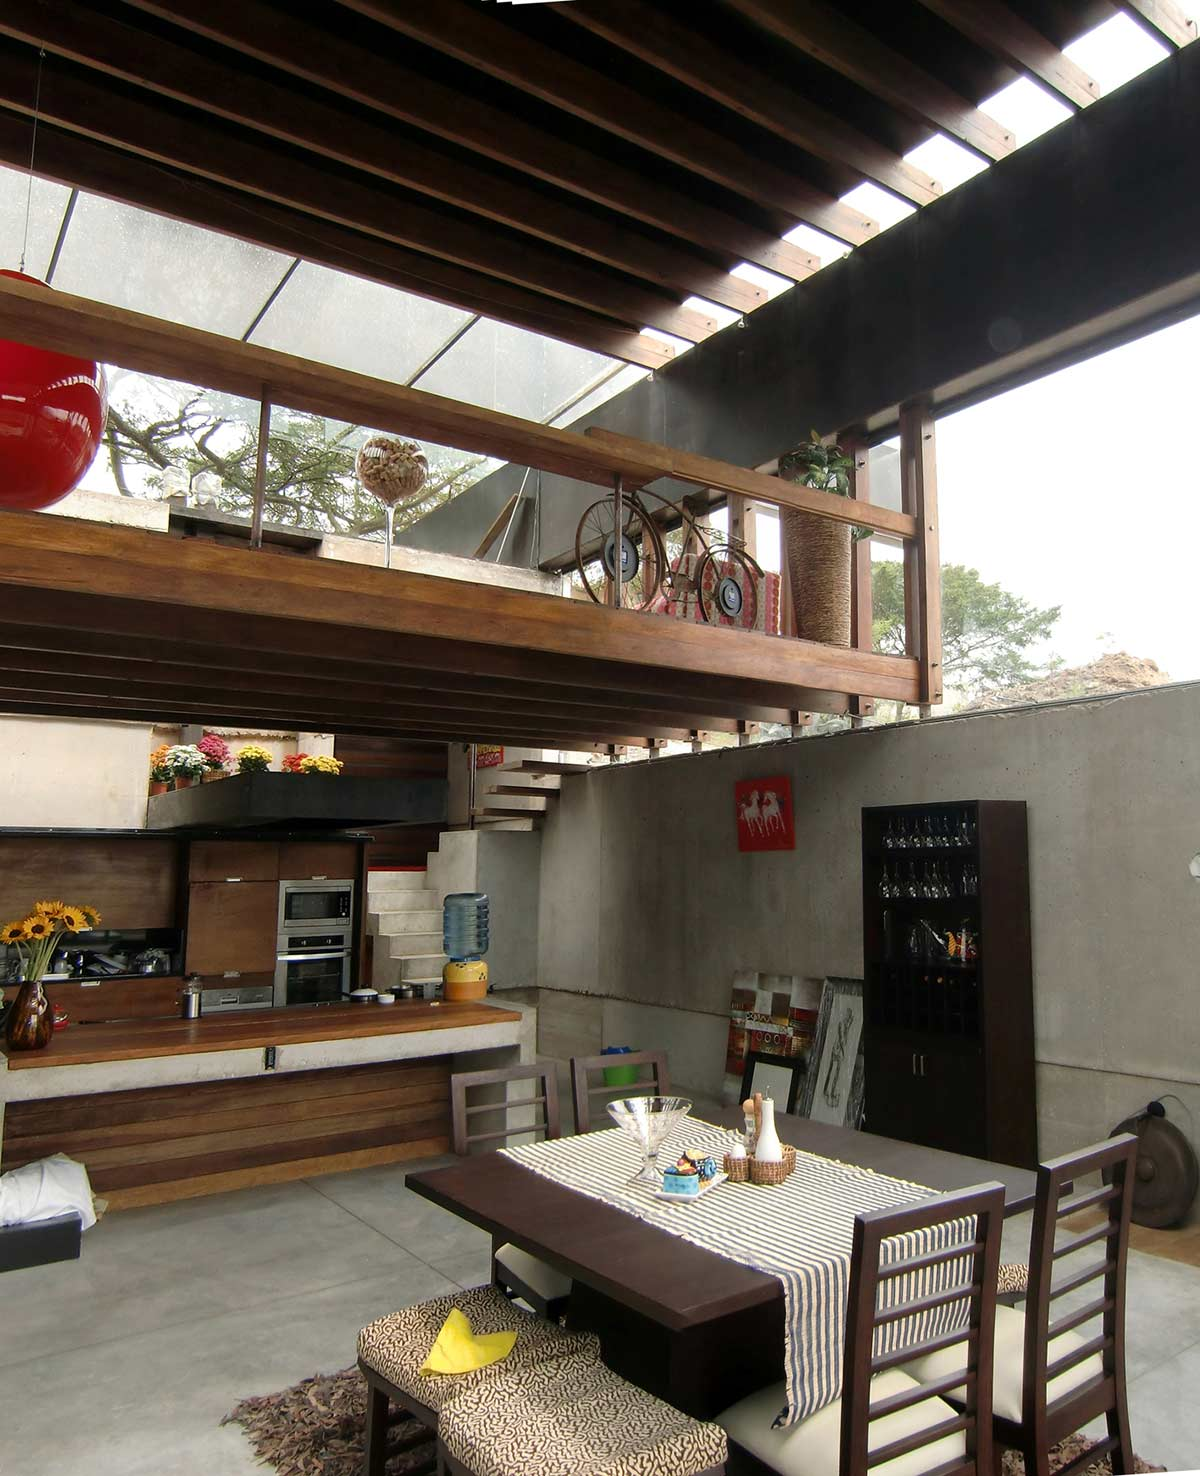 Kitchen, Dining, Mountain Home with Incredible Views in Ecuador